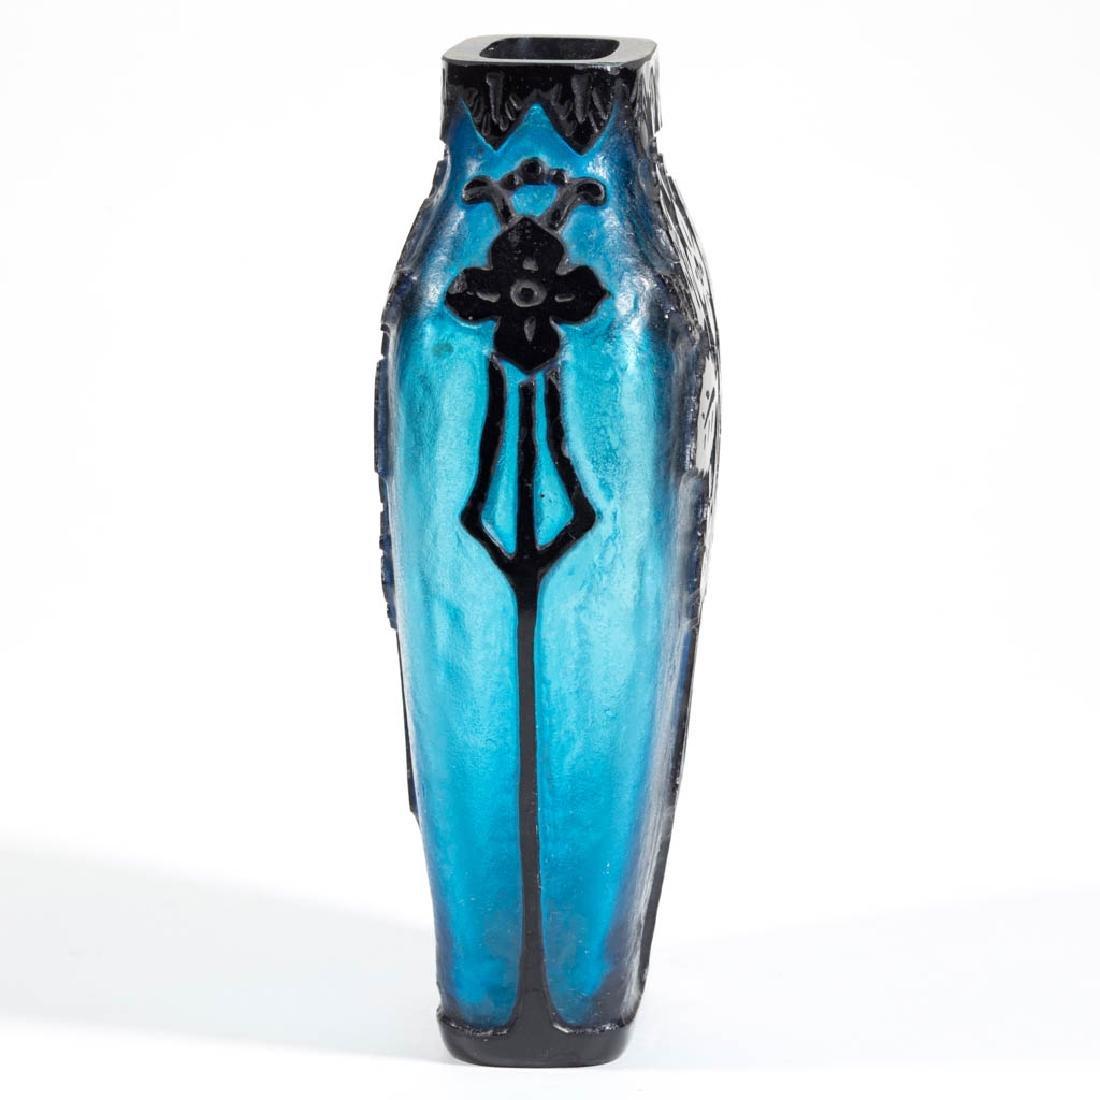 STEUBEN ACID-CUTBACK / CAMEO ART GLASS VASE - 2